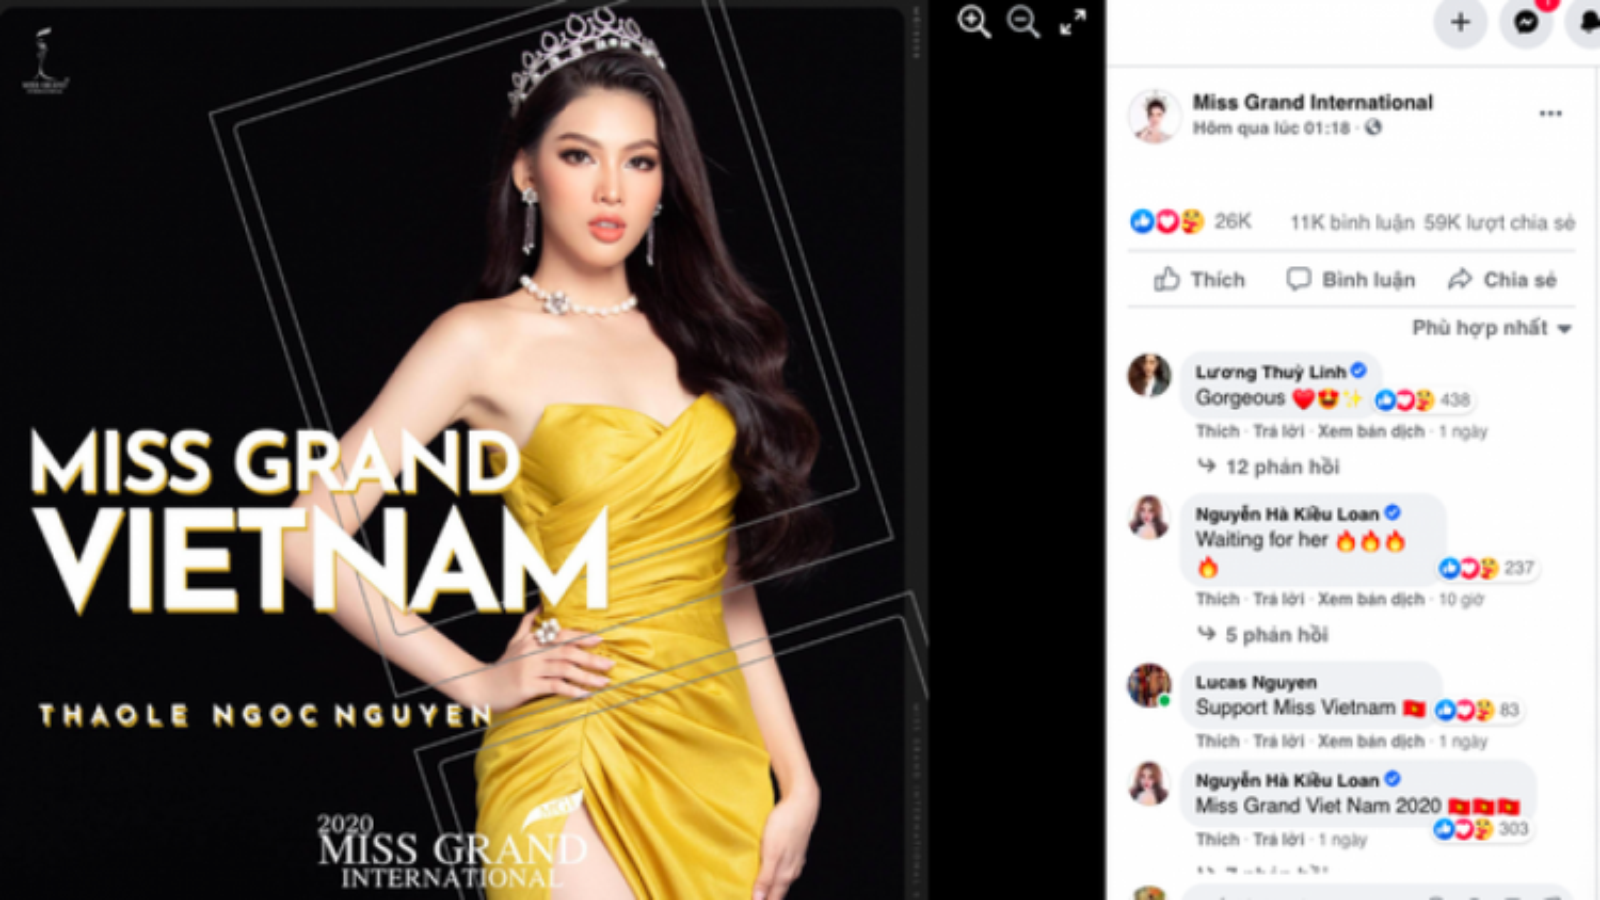 Vietnam makes top 10 in Miss Grand International fan poll